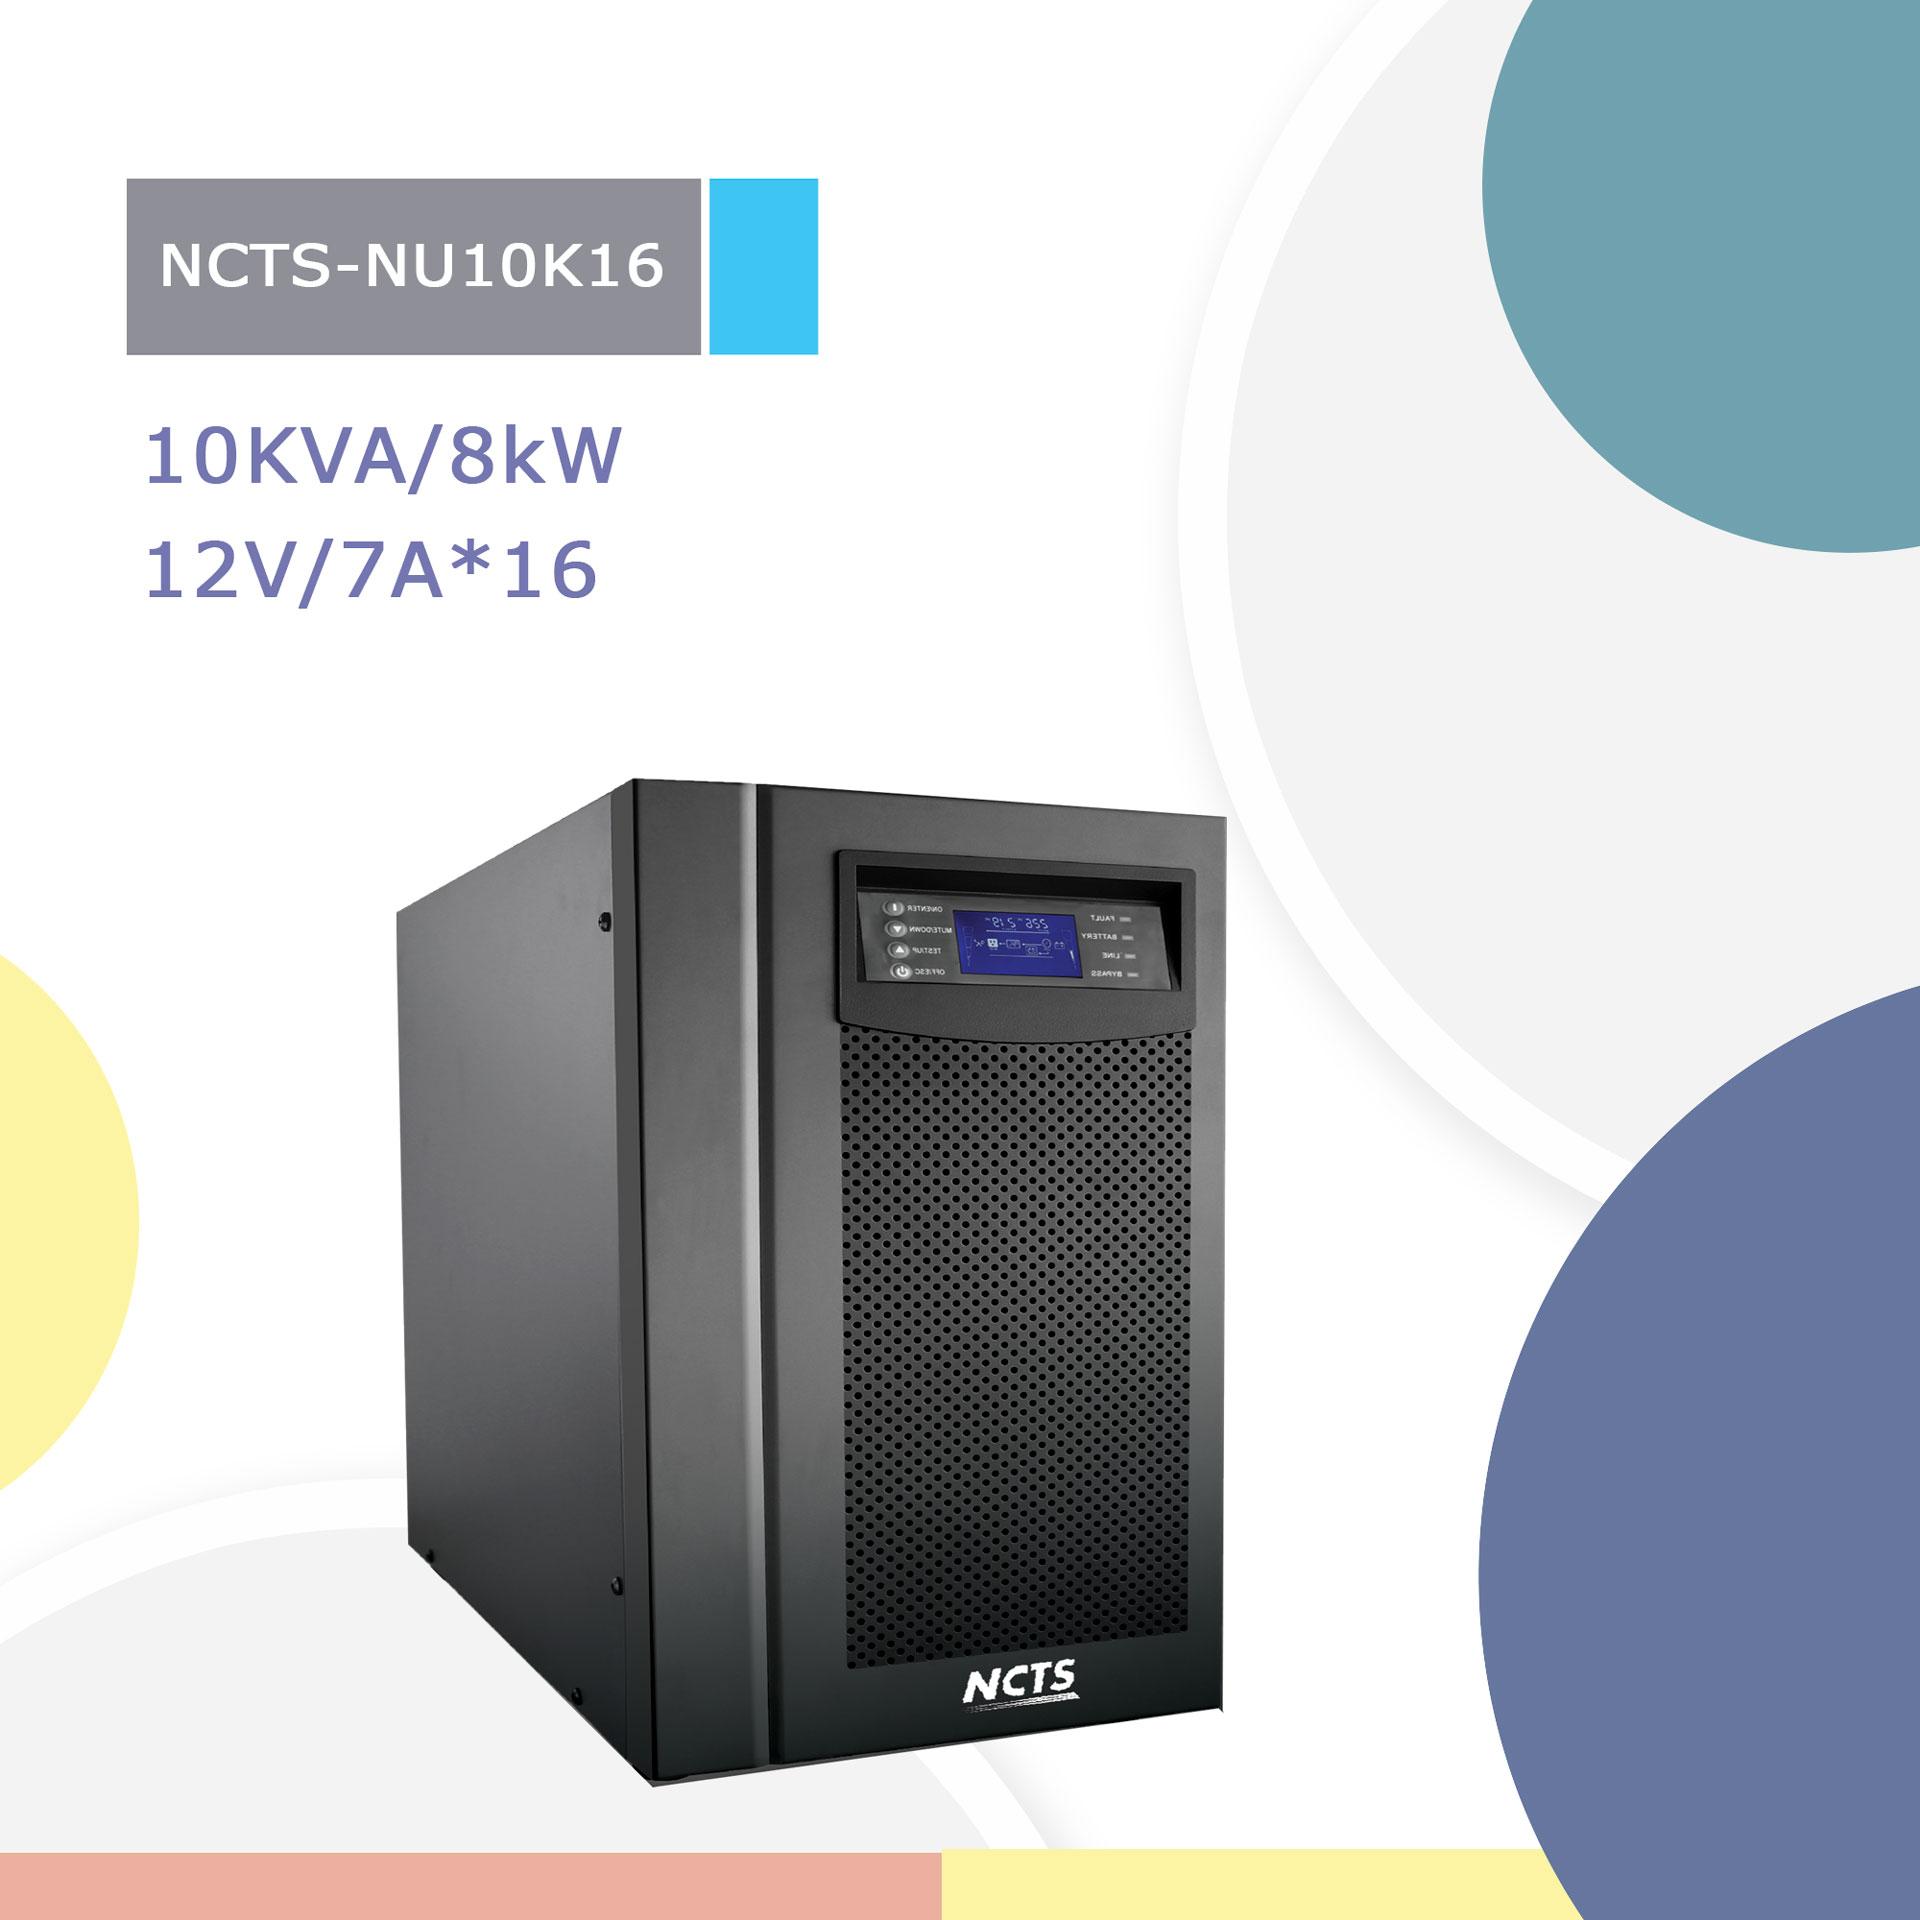 NCTS ONLINE UPS 10KVA NCTS-NU10K16